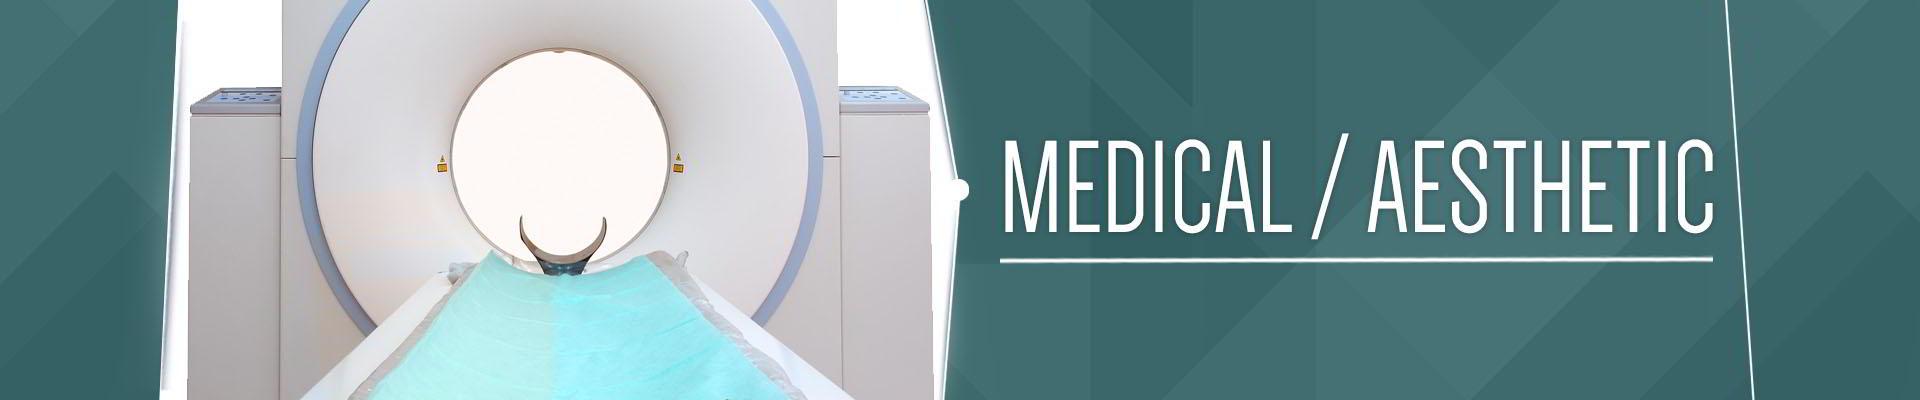 medicalBanner1